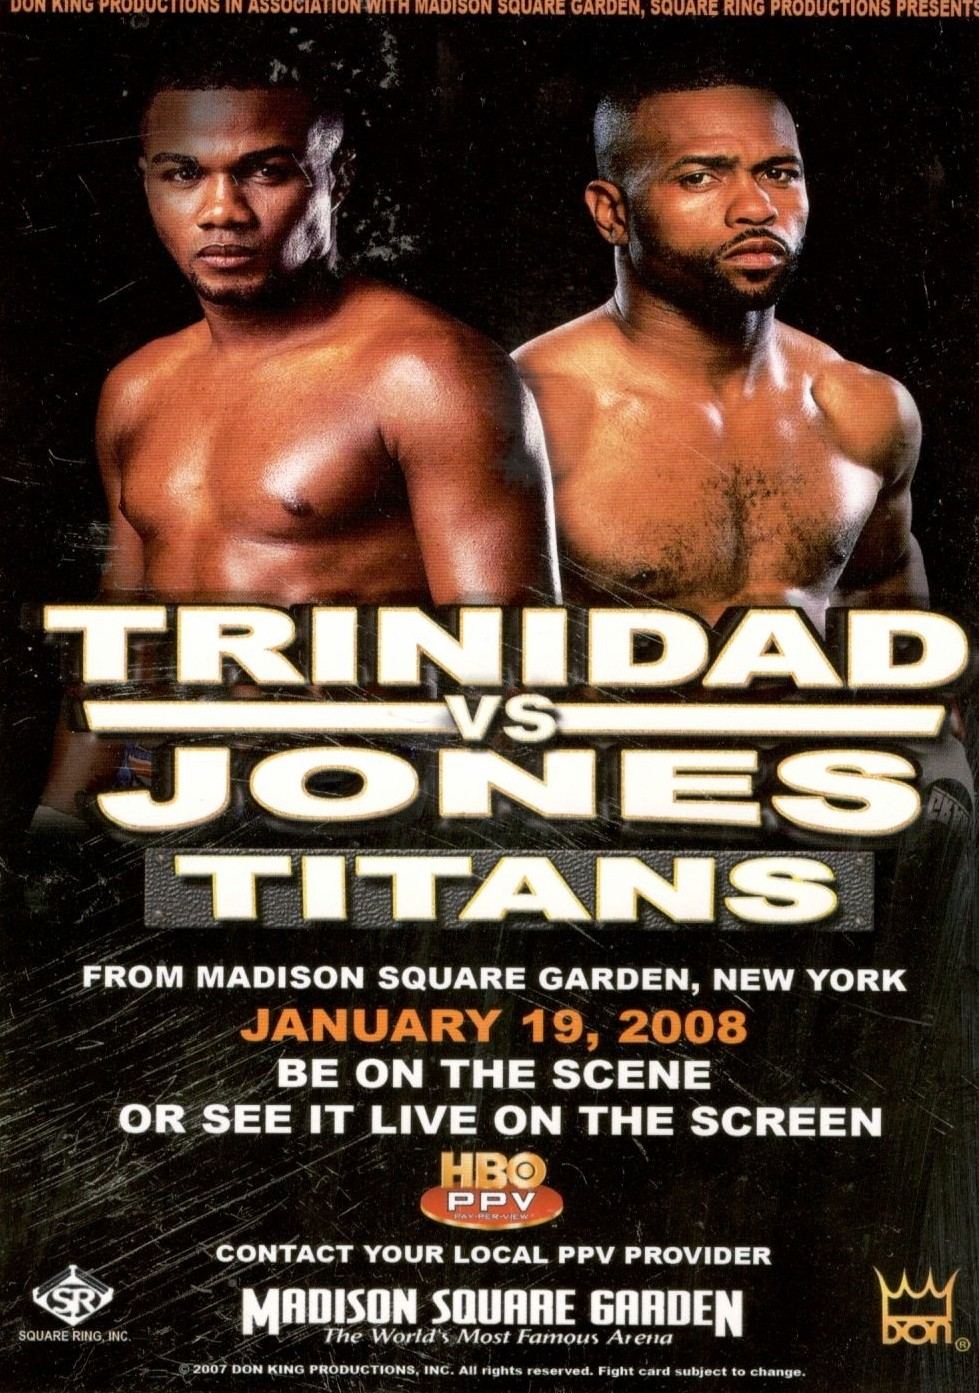 Fight Promotion - Jones vs. Trinidad 2008 Promo Card.